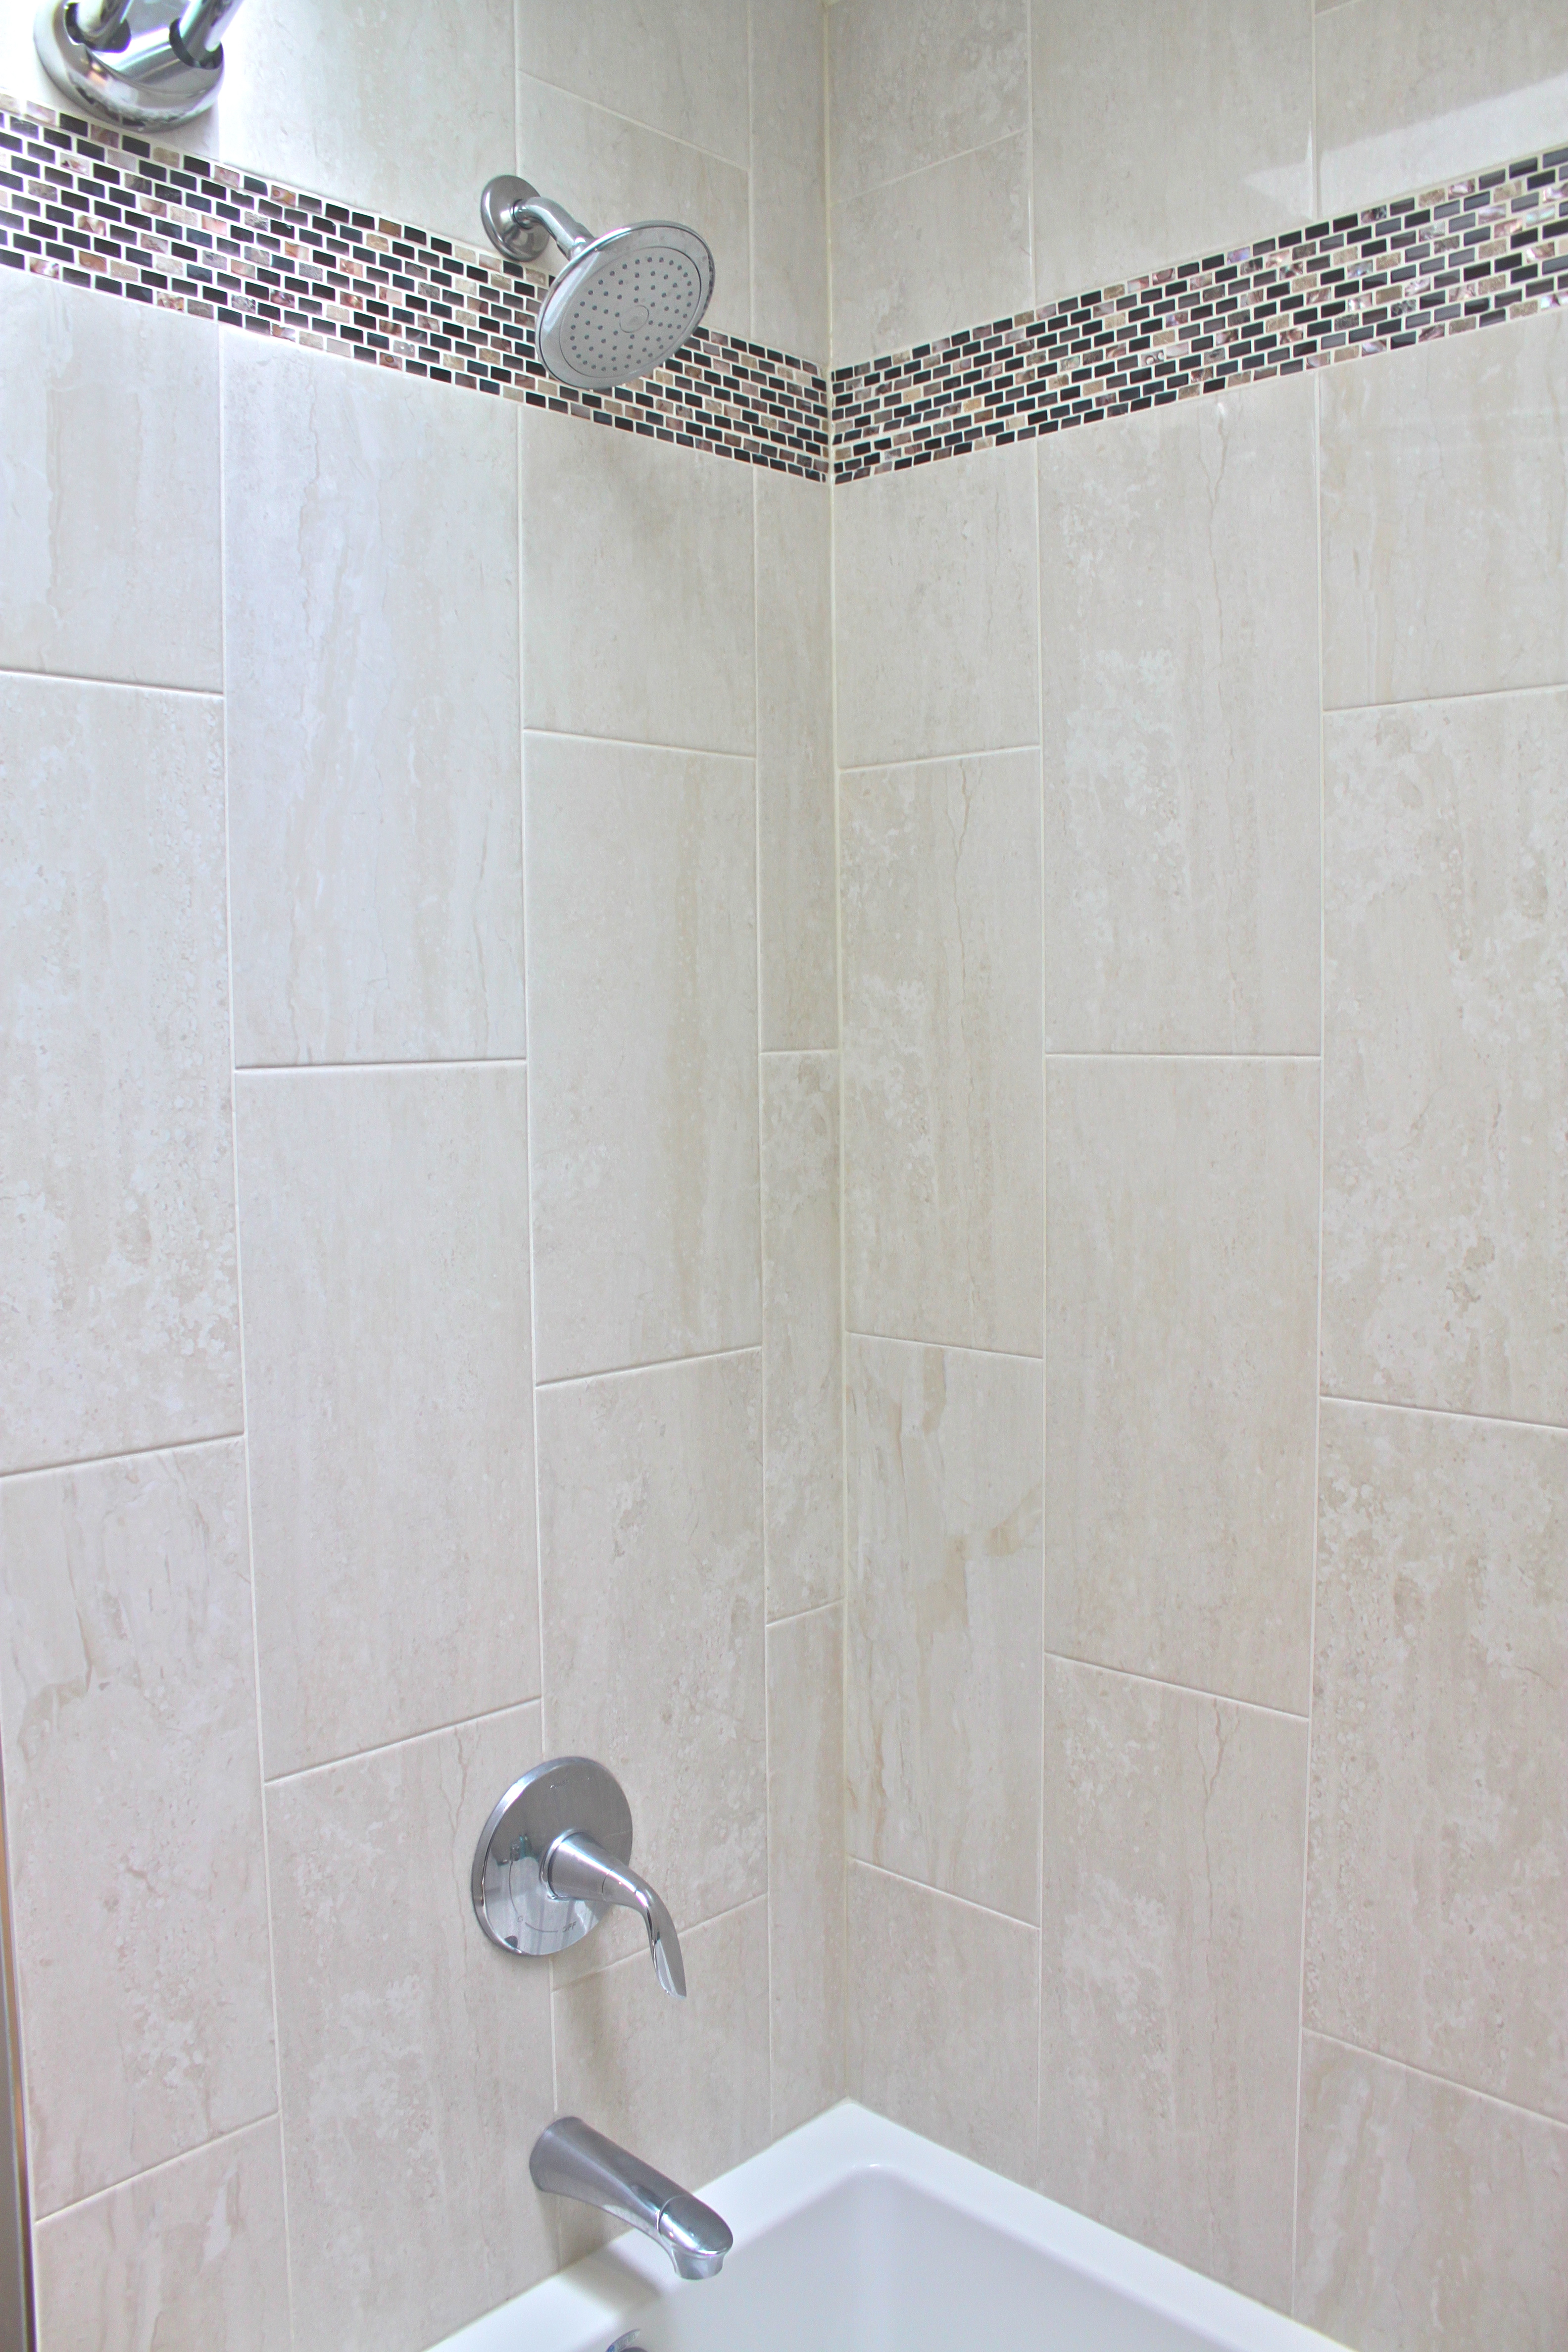 Bathroom Renovations in Surrey, BC - Novero Homes and Renovations